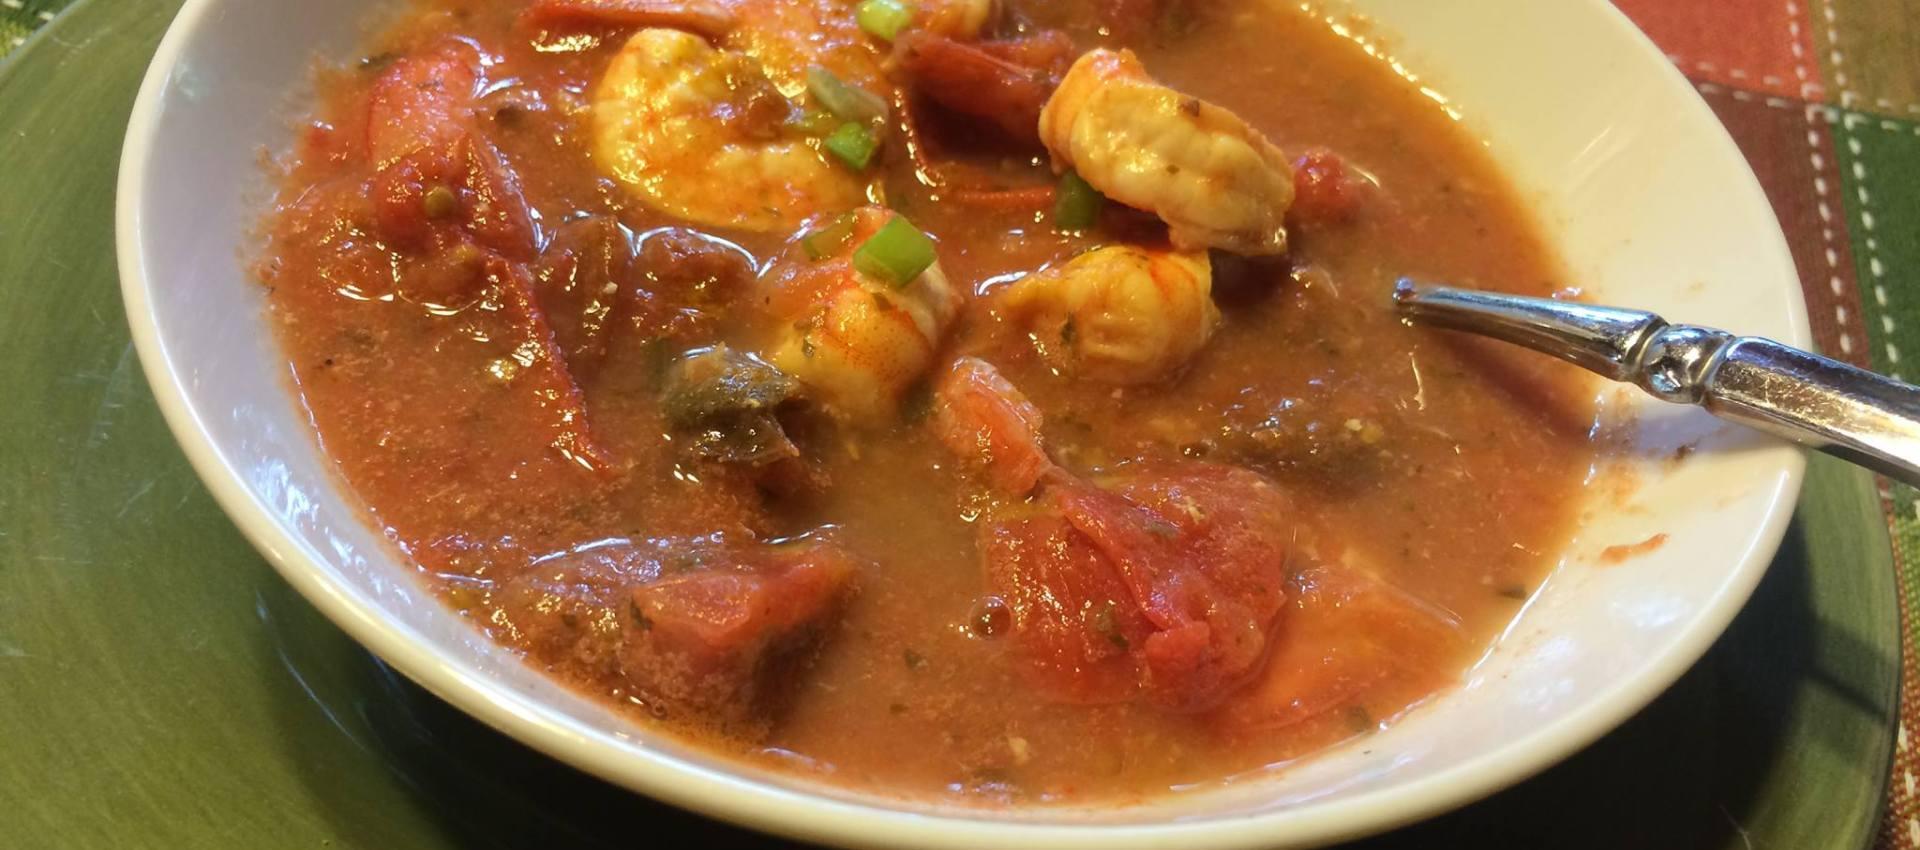 Spicy Shrimp Amp Tomato Soup Hcg Phase 2 Diet Recipe Hcg Diet Info Recipes